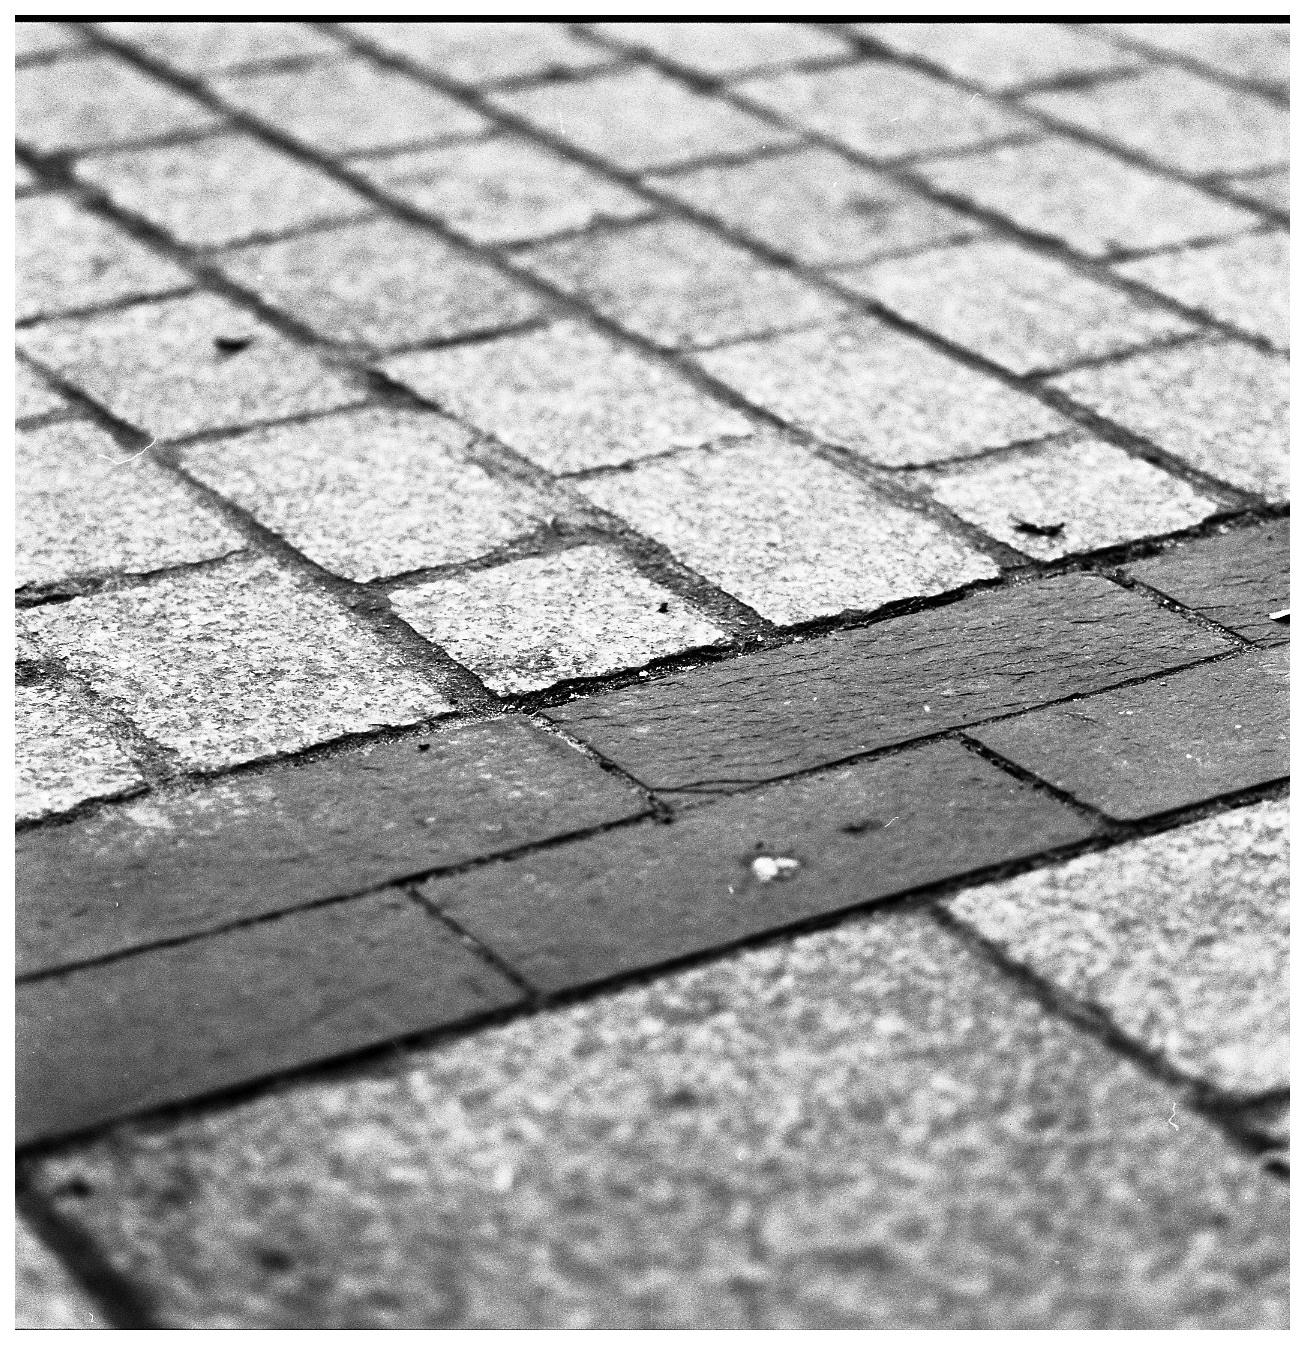 Hassel_BW_Kraków327.jpg